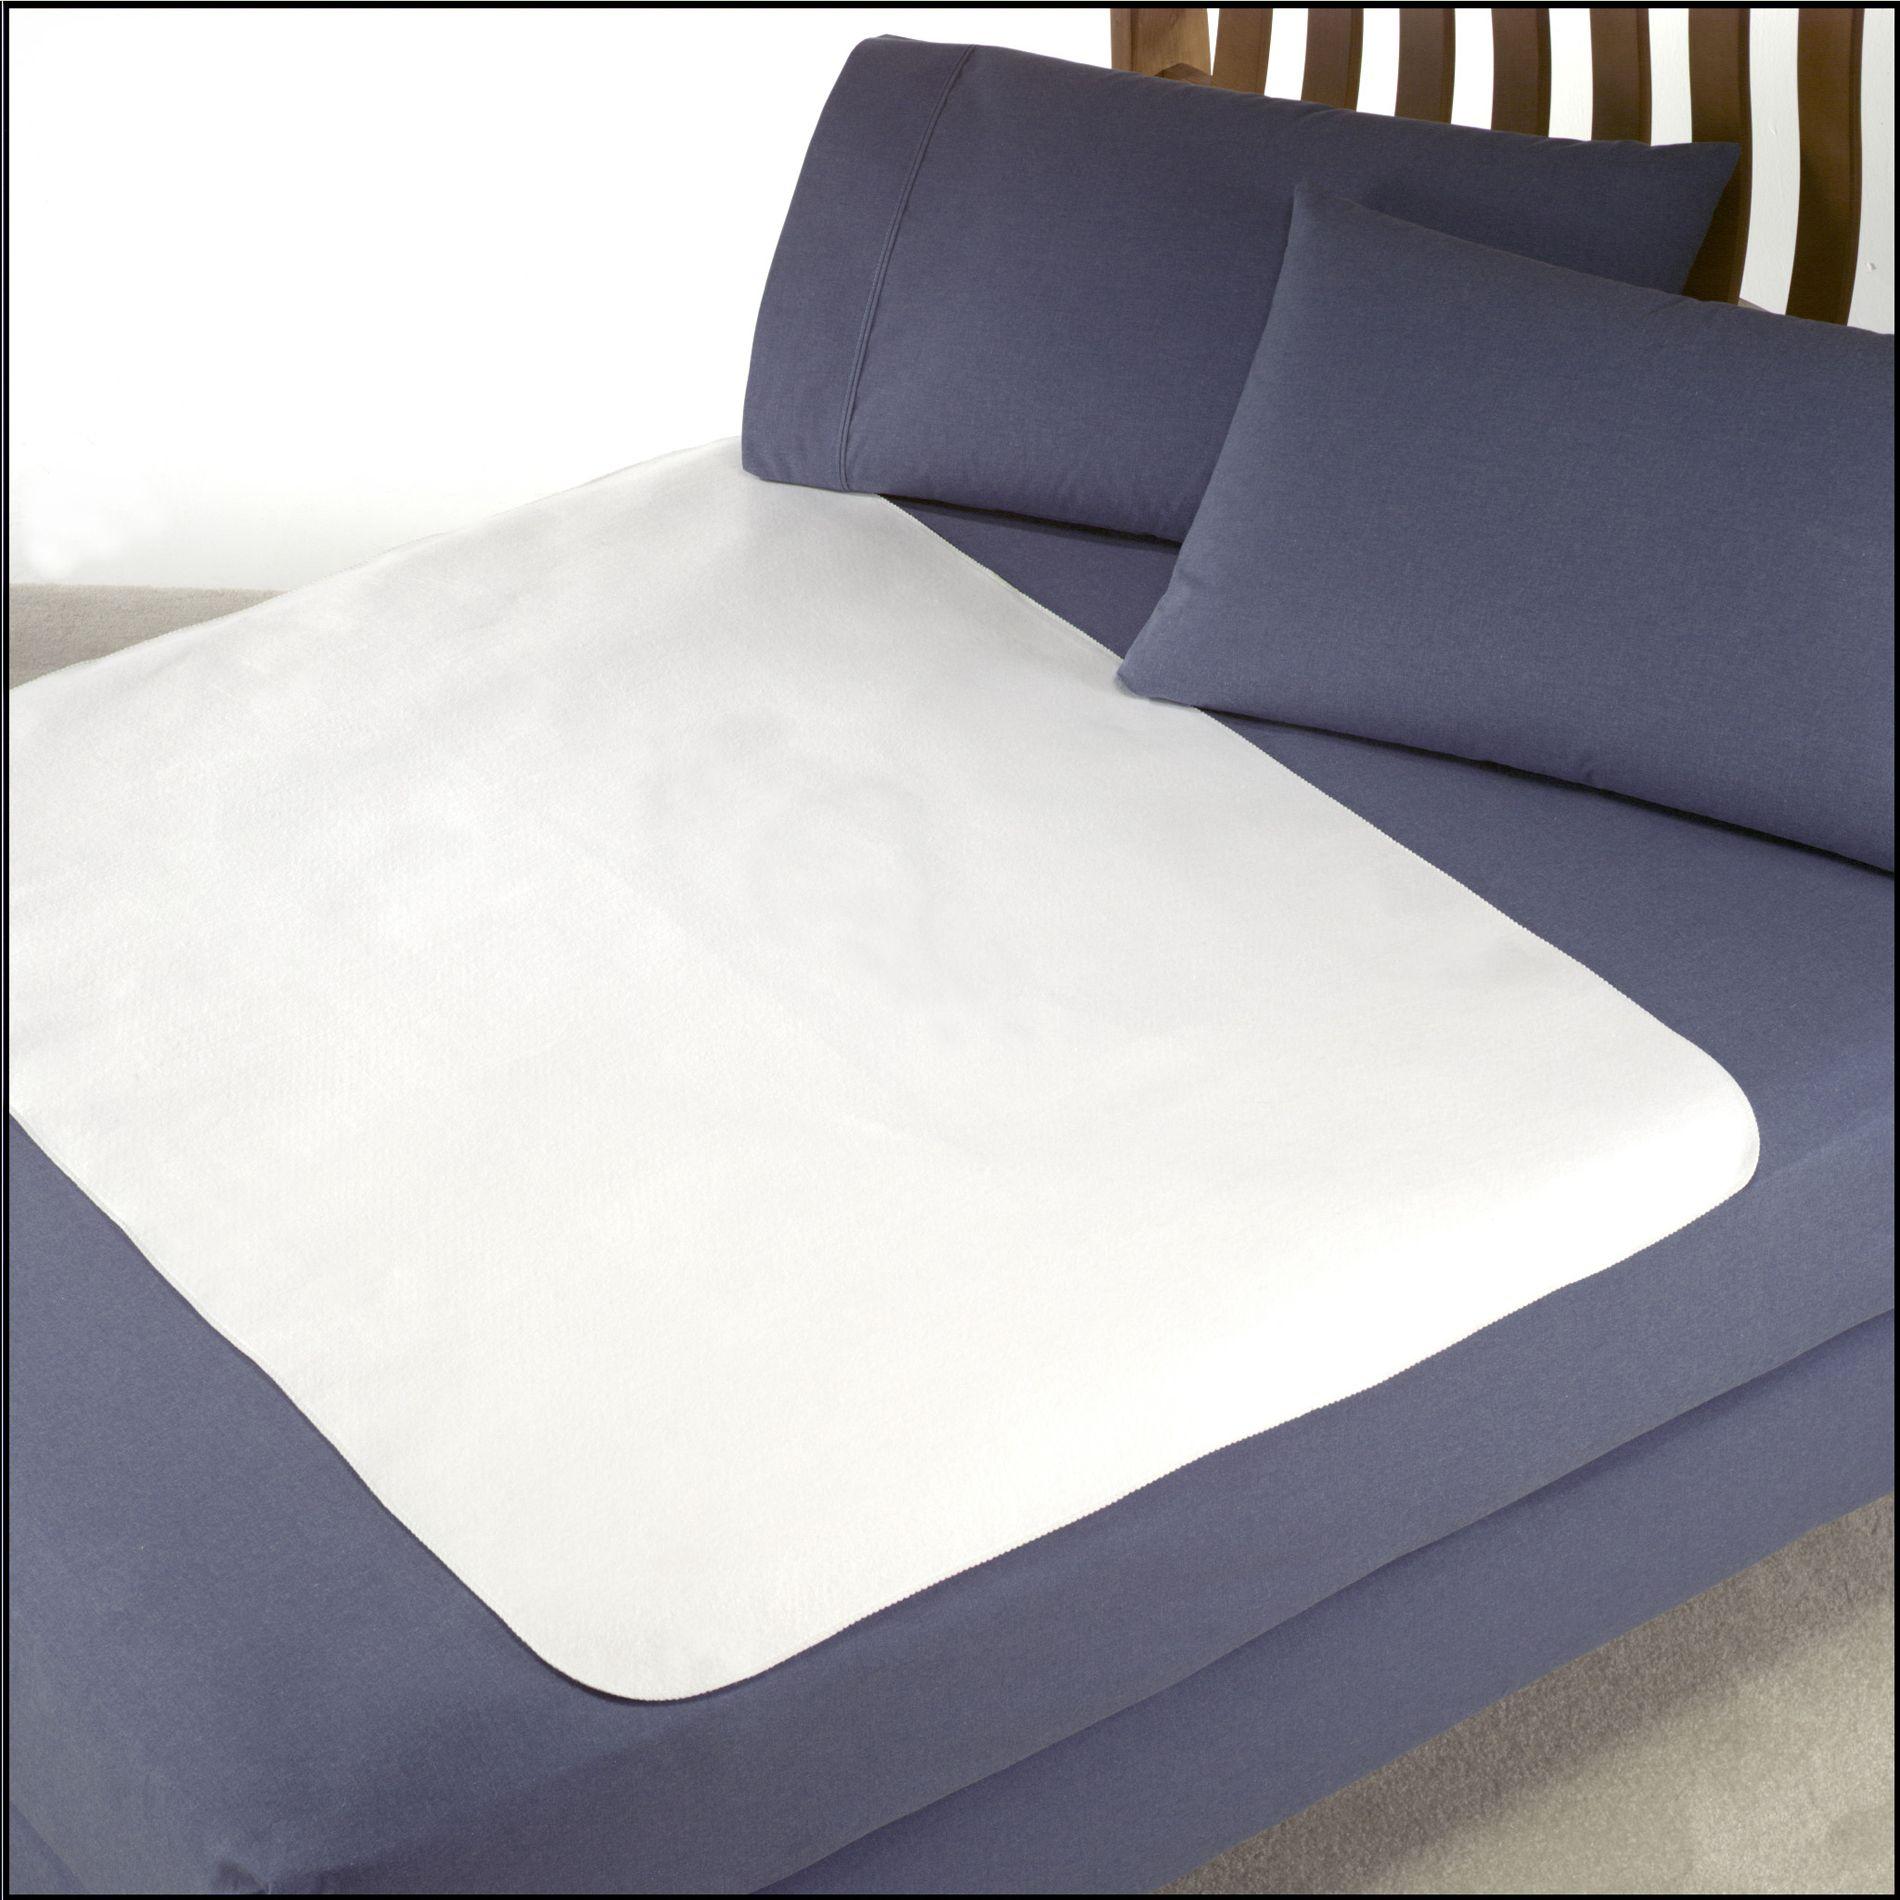 Cannon Waterproof Underpad Mattress Pad - Home - Bed & Bath - Bedding  Basics - Mattress Pads & Pillows - Mattress Pads & Protectors